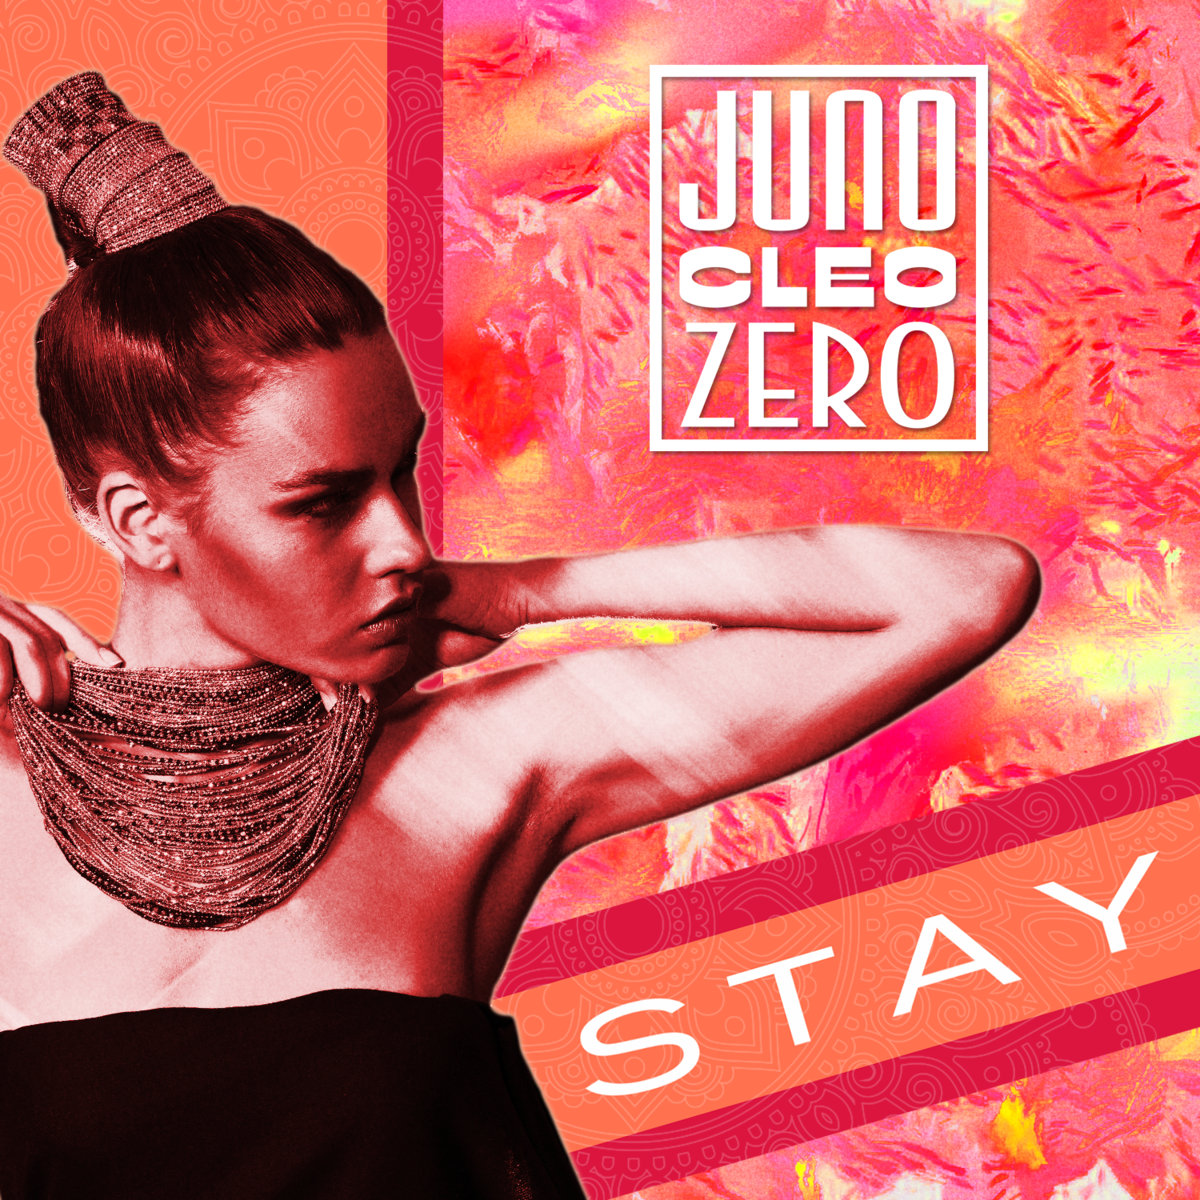 Juno Cleo Zero - Stay